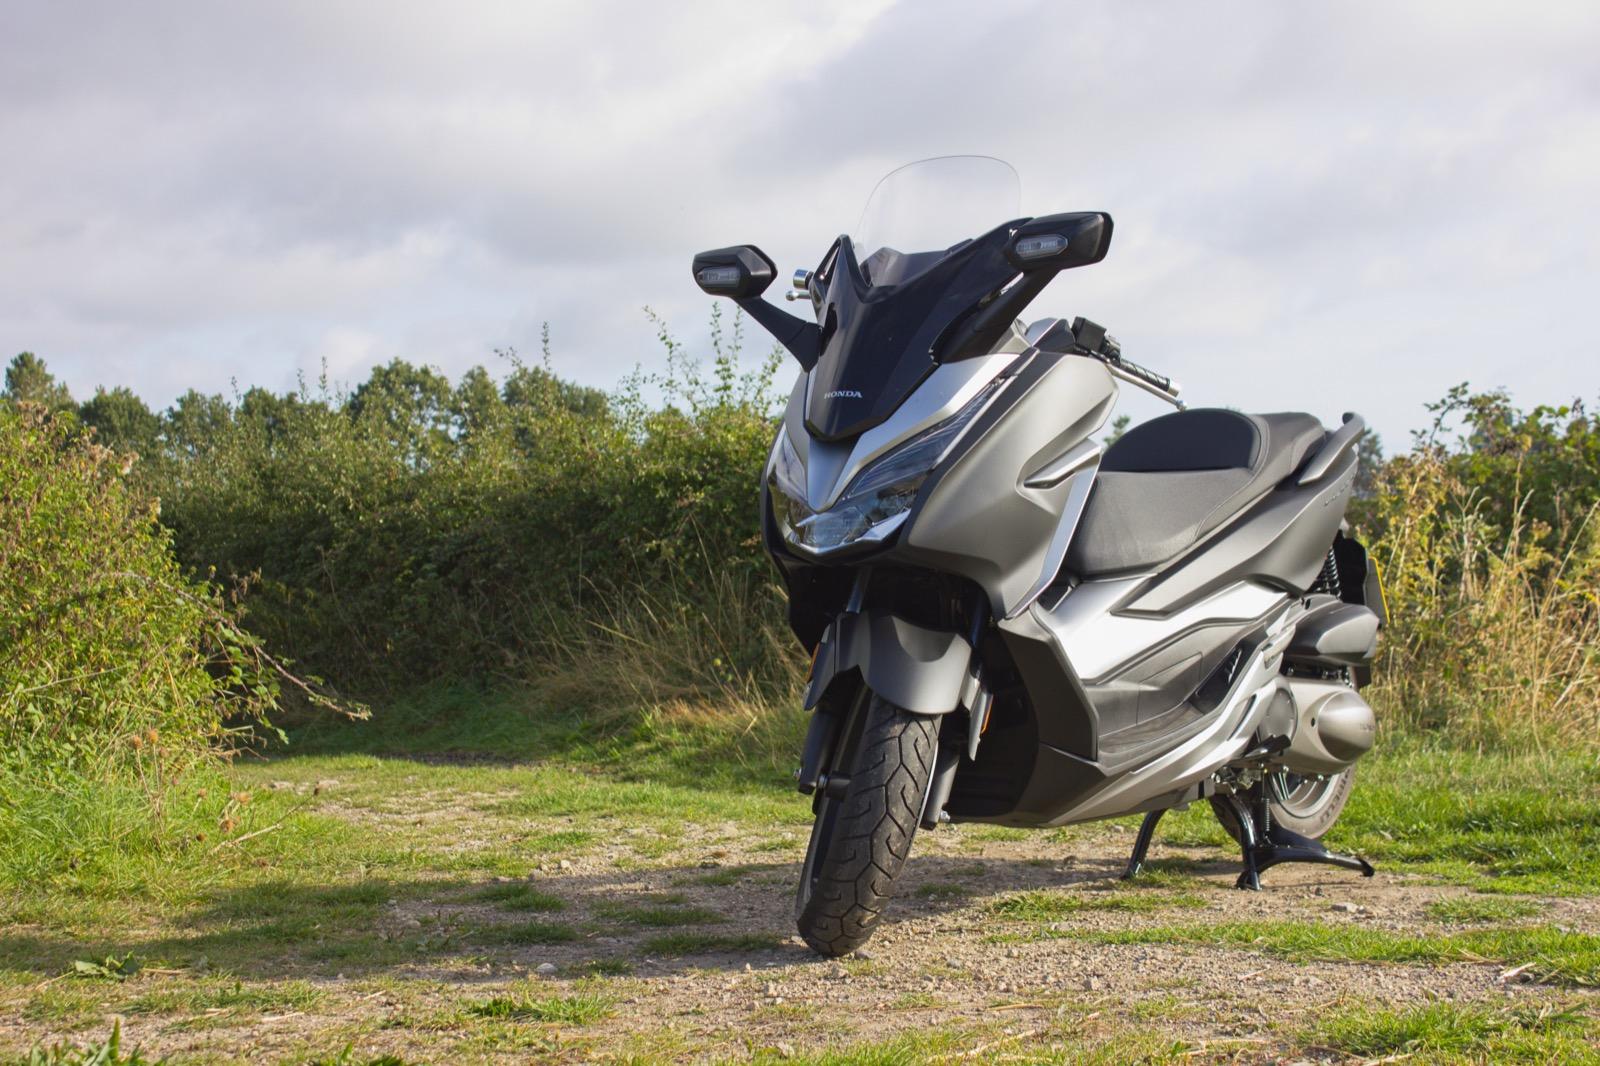 Review: 2018 Honda Forza 300   Boy Meets Bike